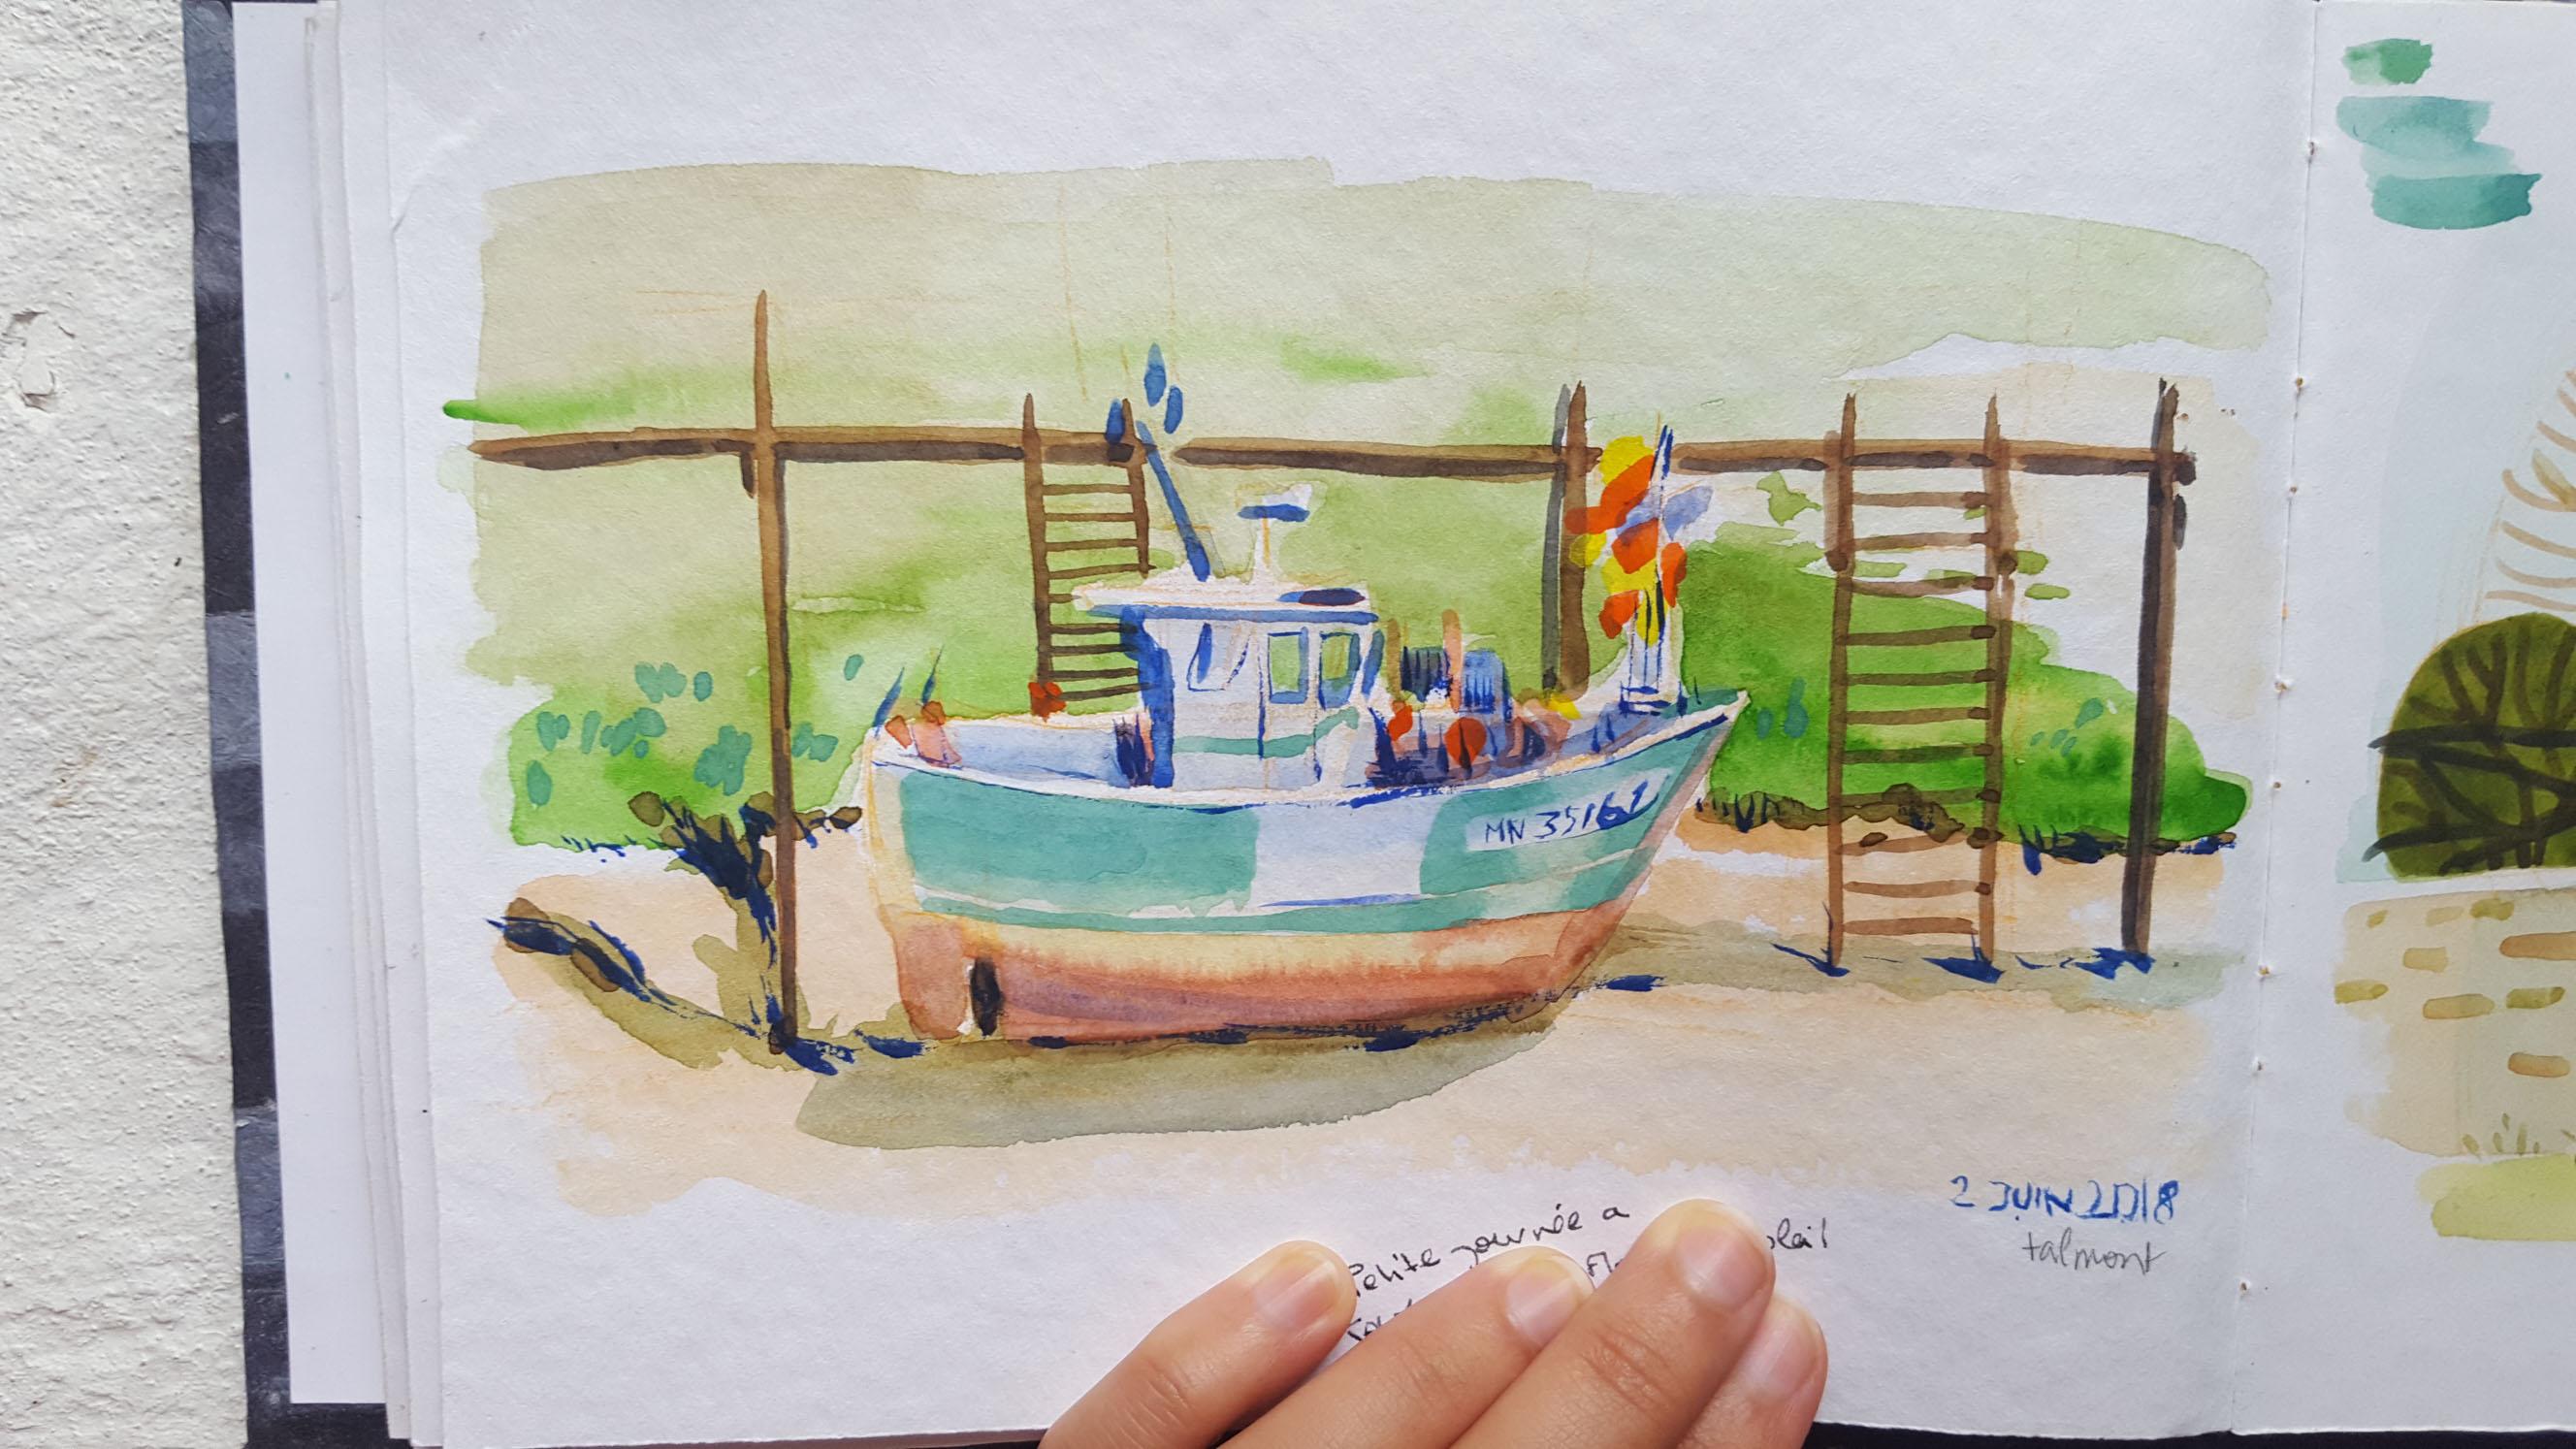 Sketchbook : IsaArne [ Challenge de l'ete P7 ] - Page 5 Facecr35